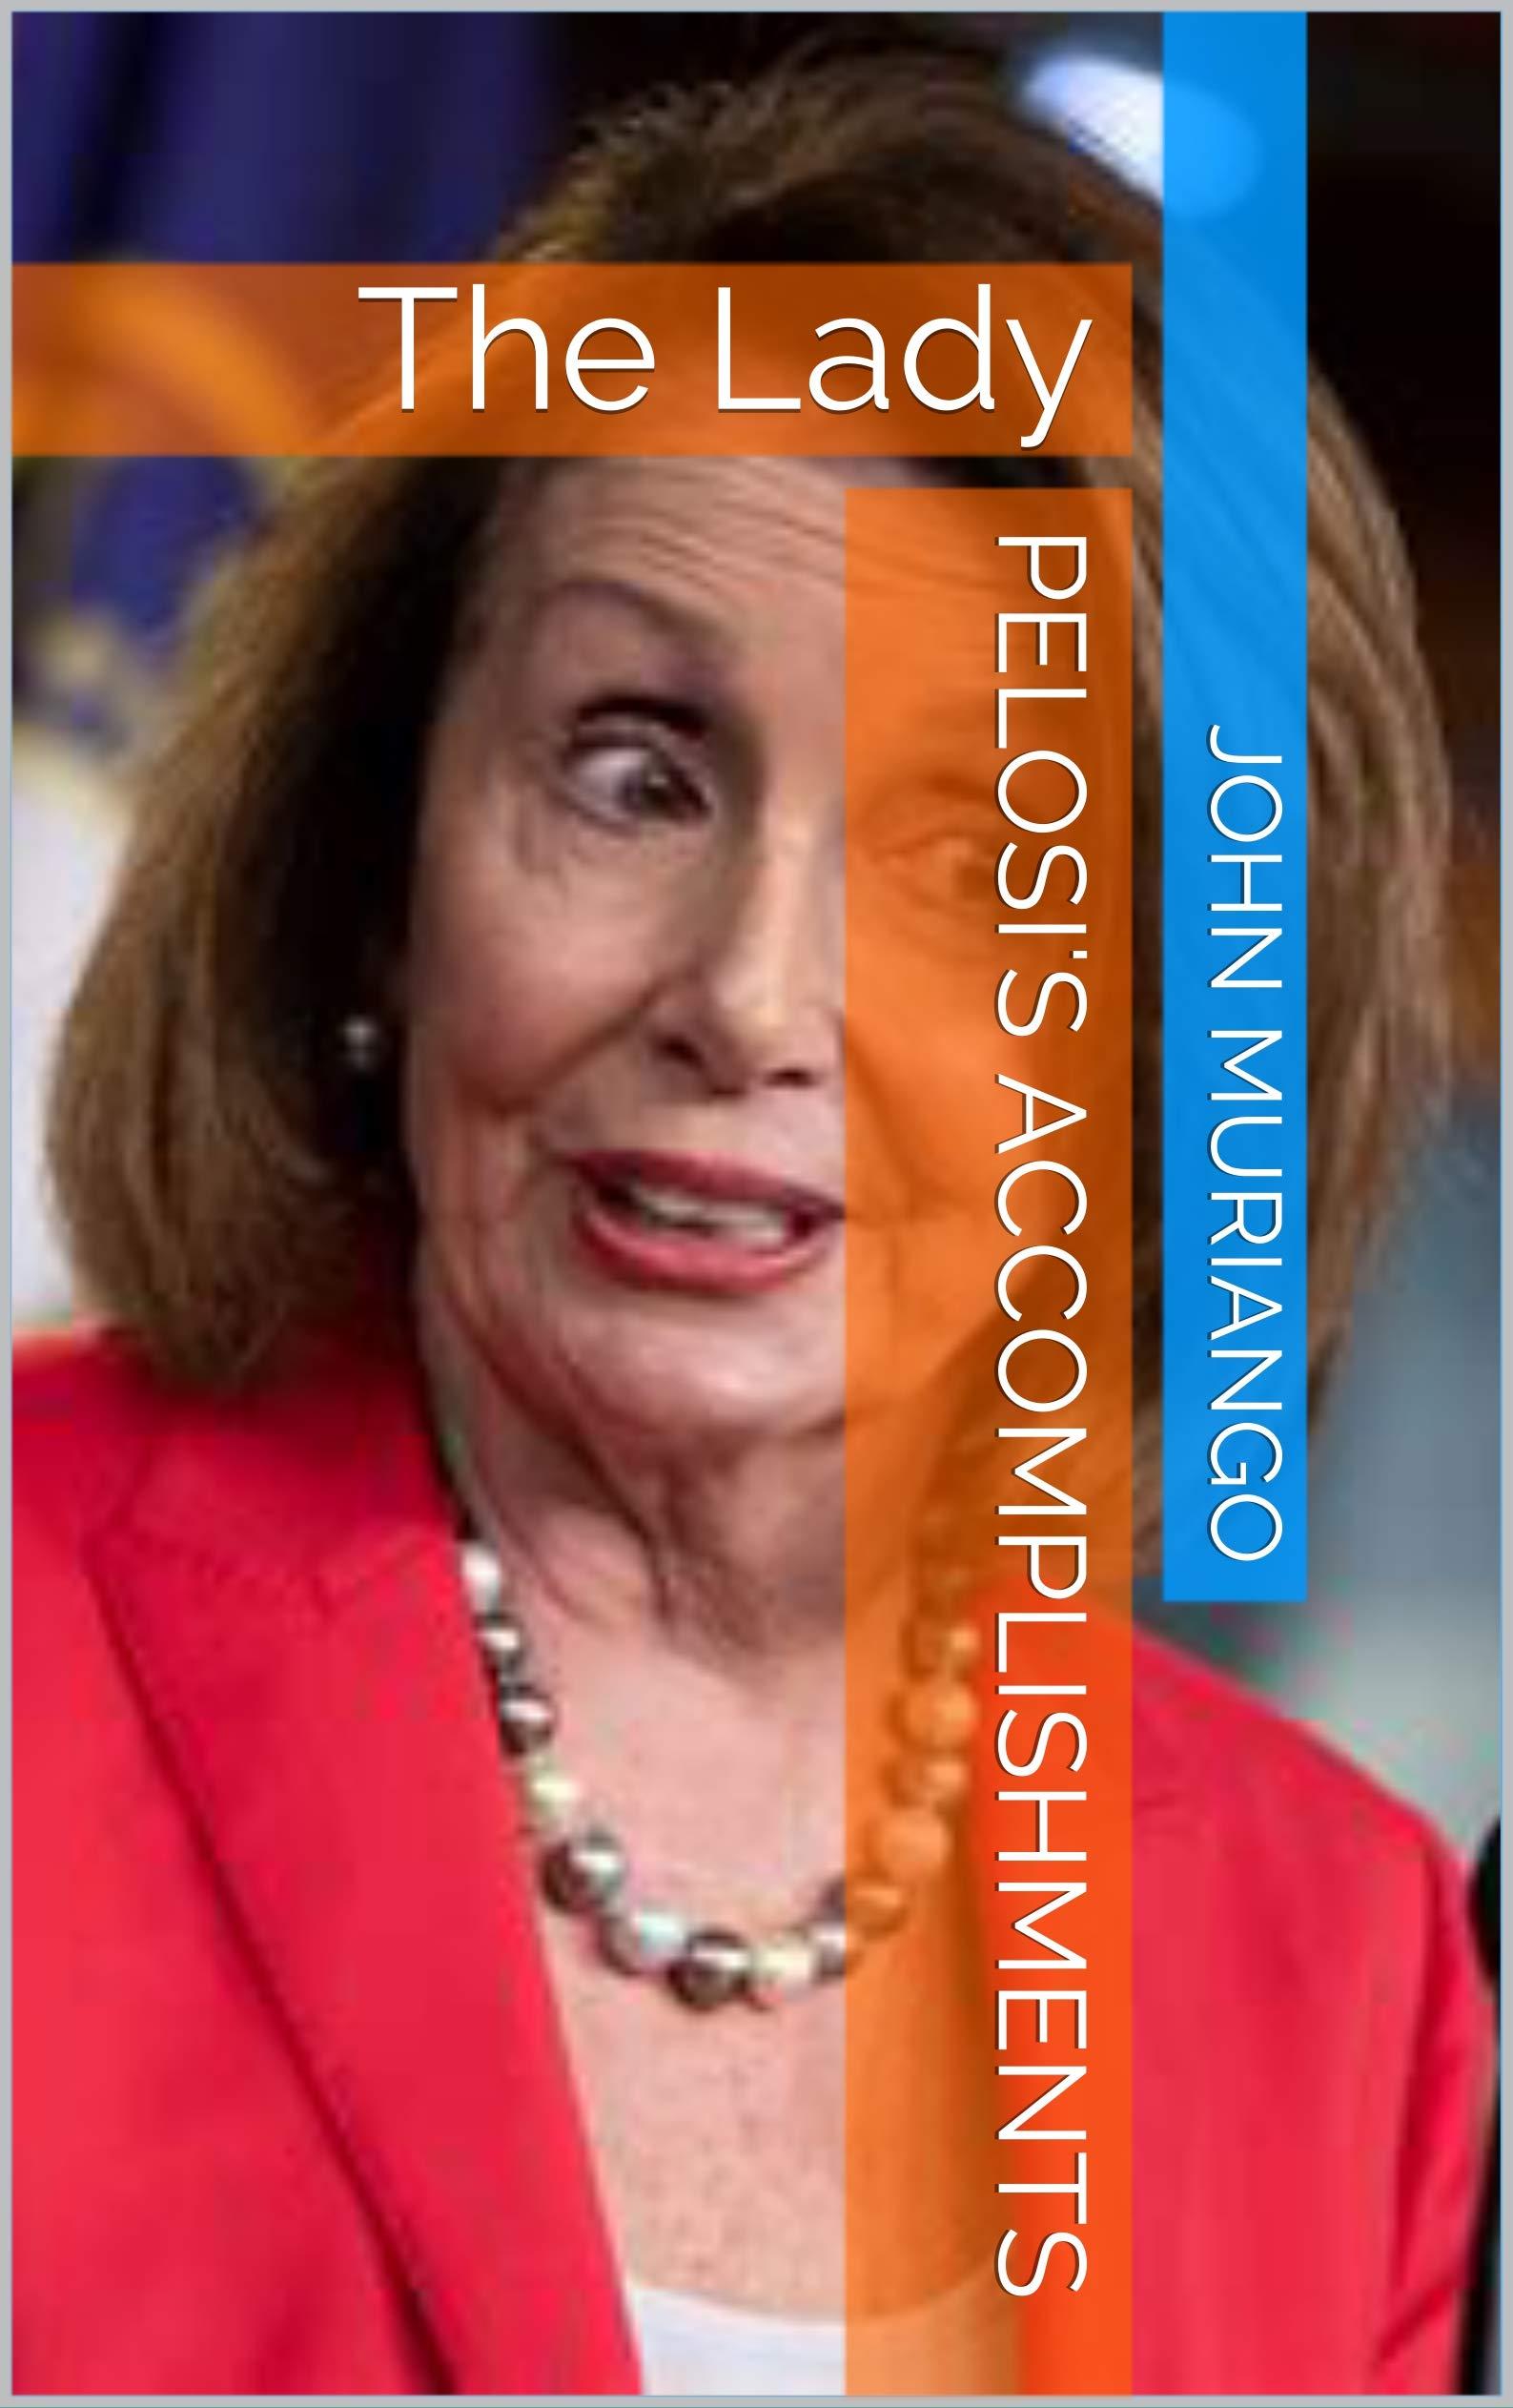 Pelosi's Accomplishments: The Lady